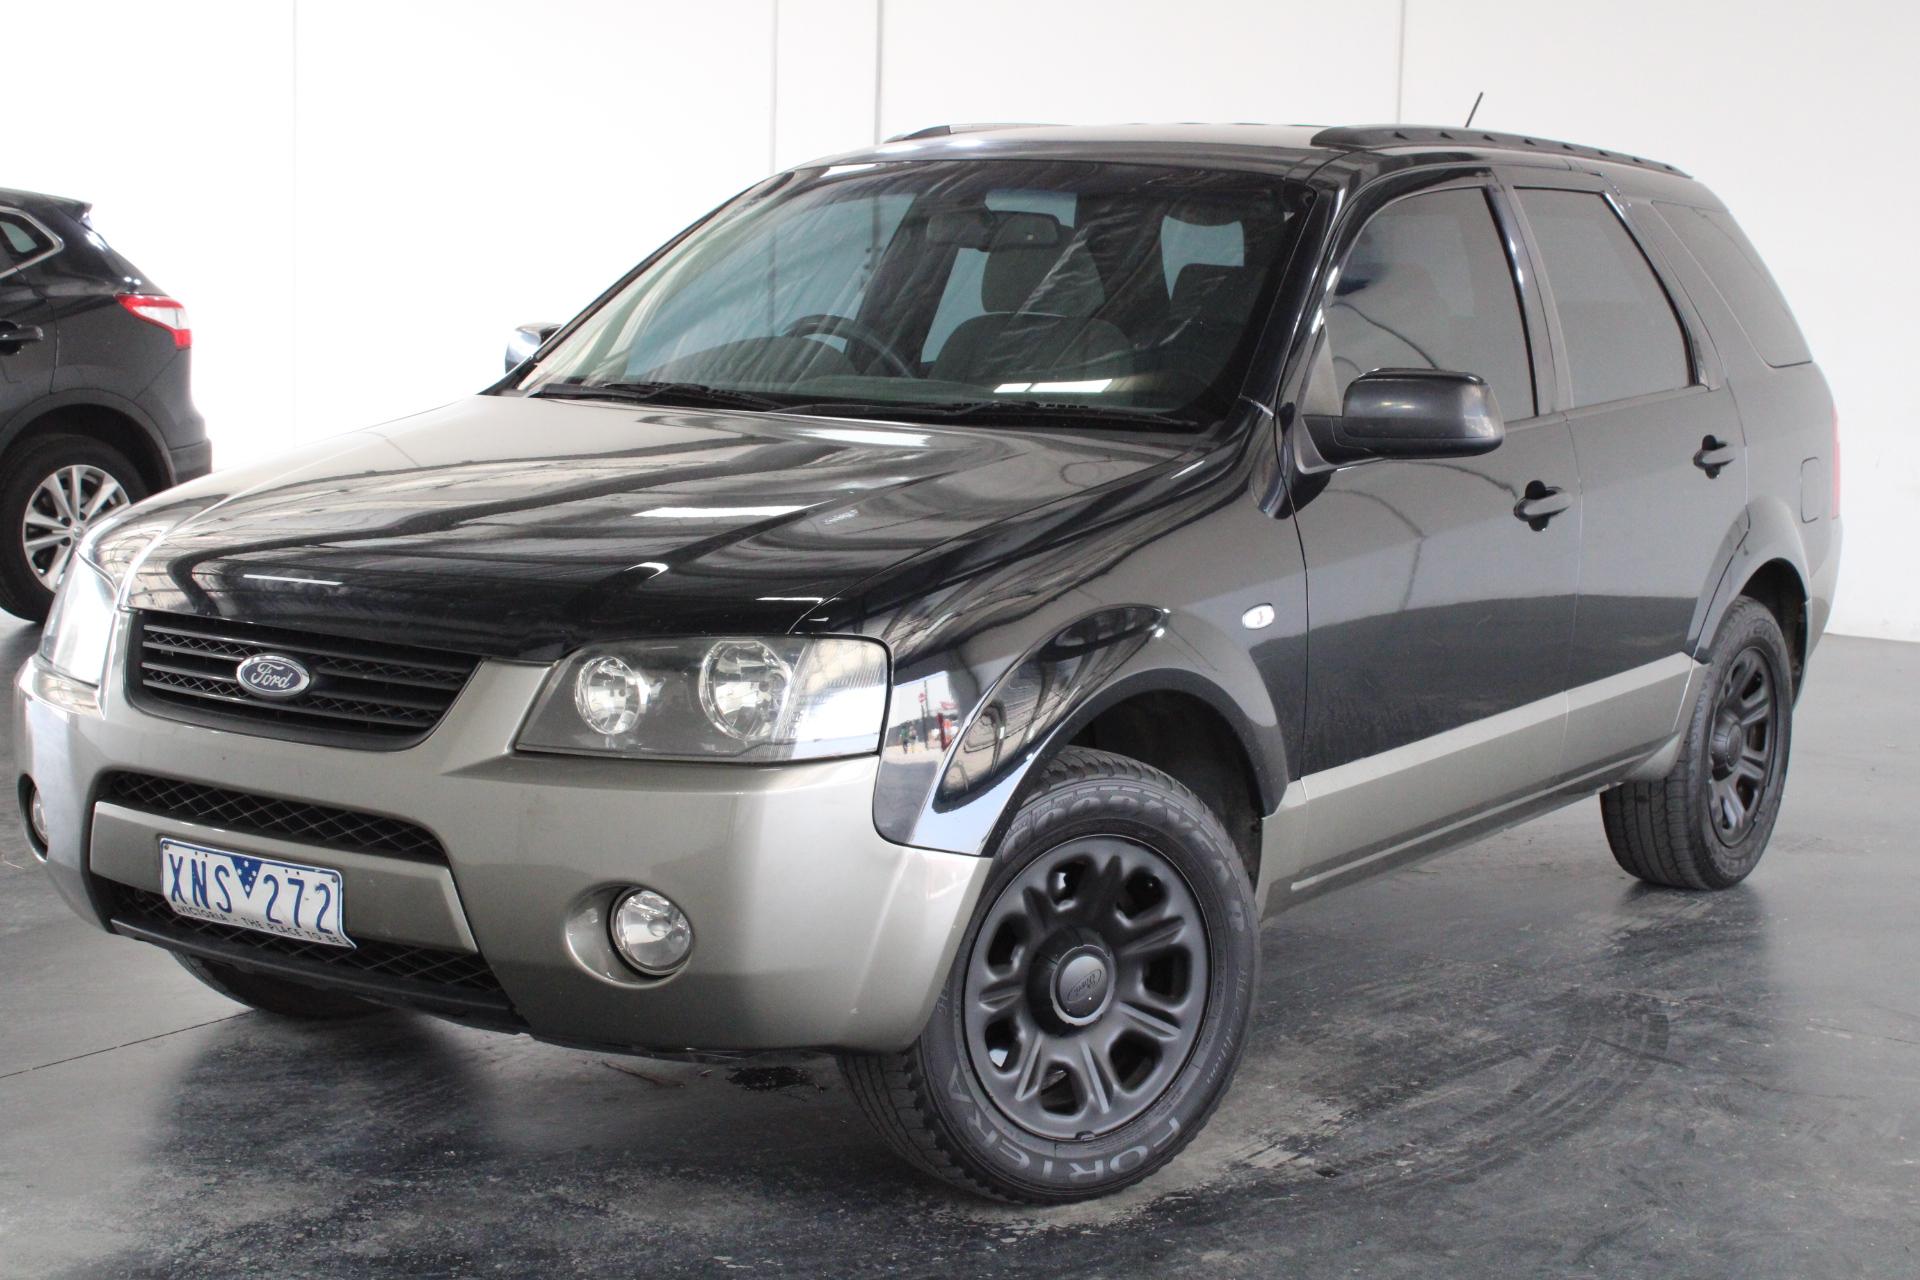 2005 Ford Territory TX (4x4) SX Automatic 7 Seats Wagon